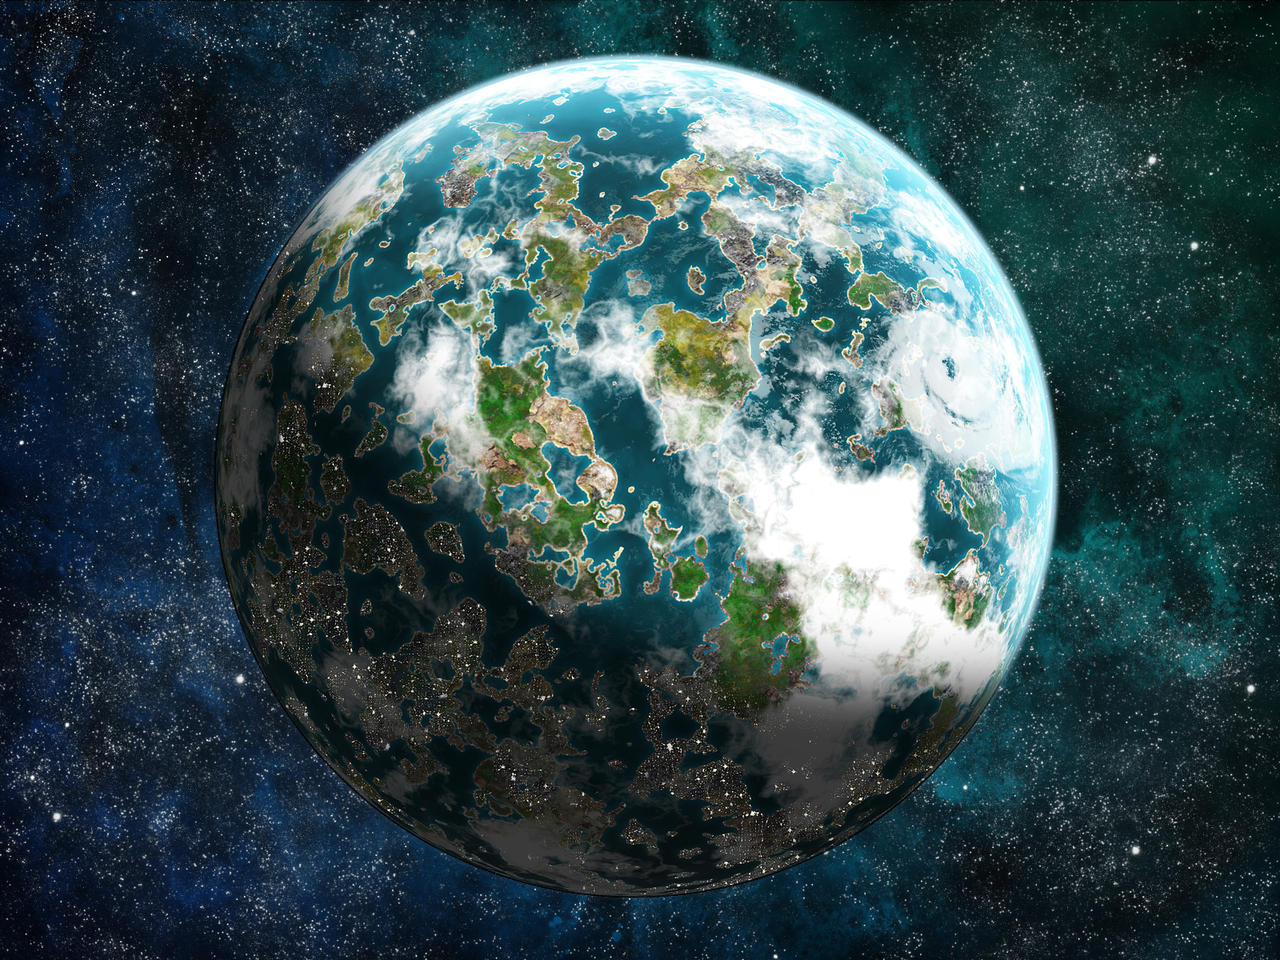 Earthlike planet by DaShadeE on DeviantArt